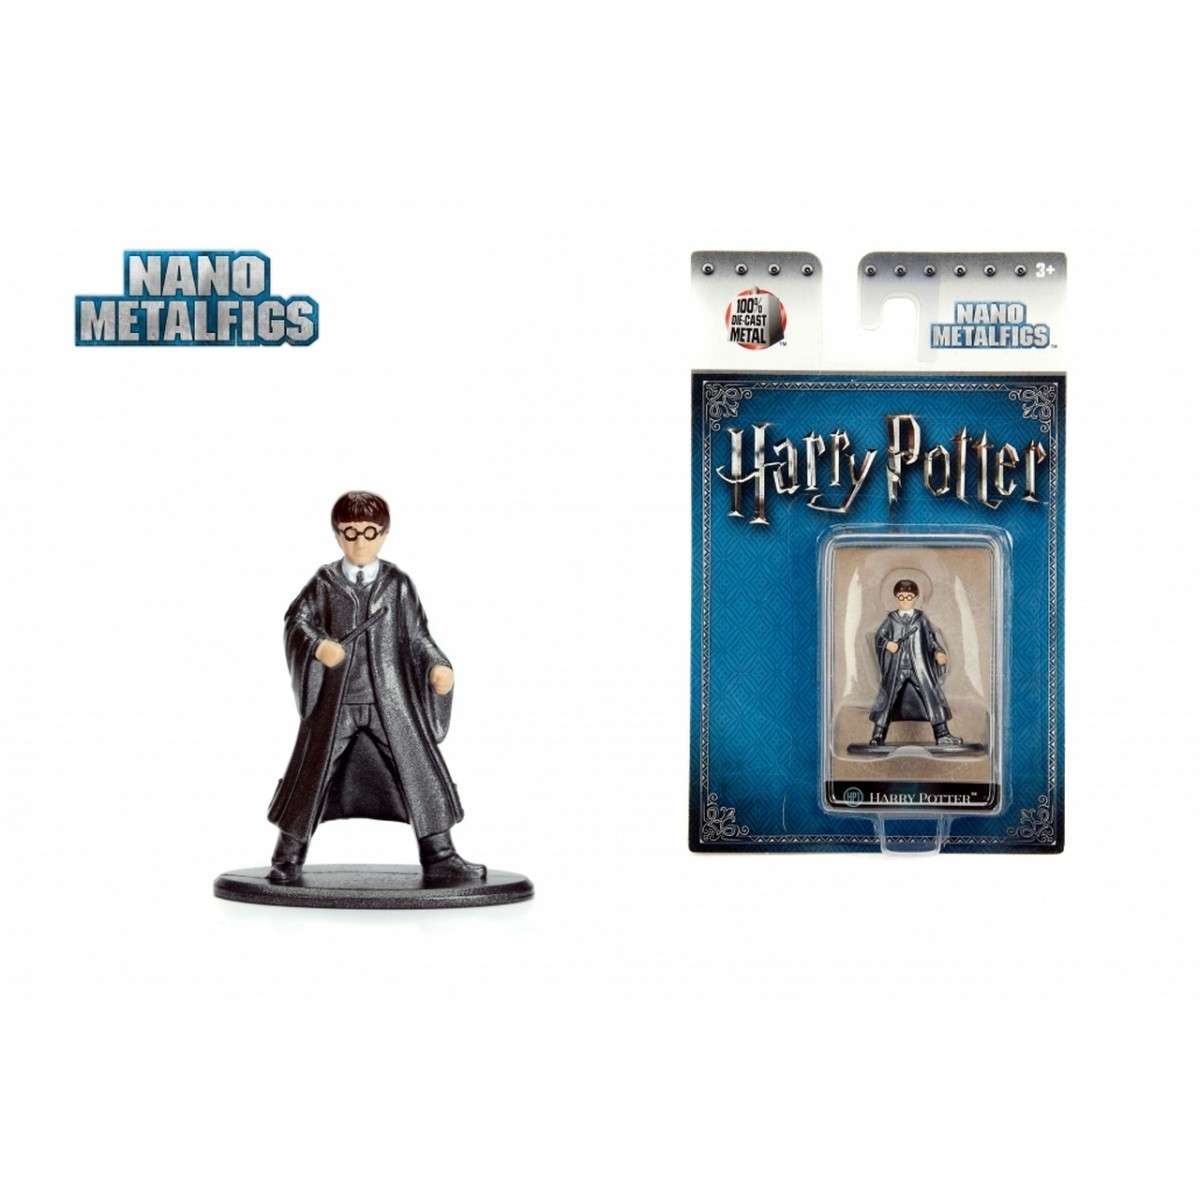 Nano Metalfigs: Harry Potter (HP1)